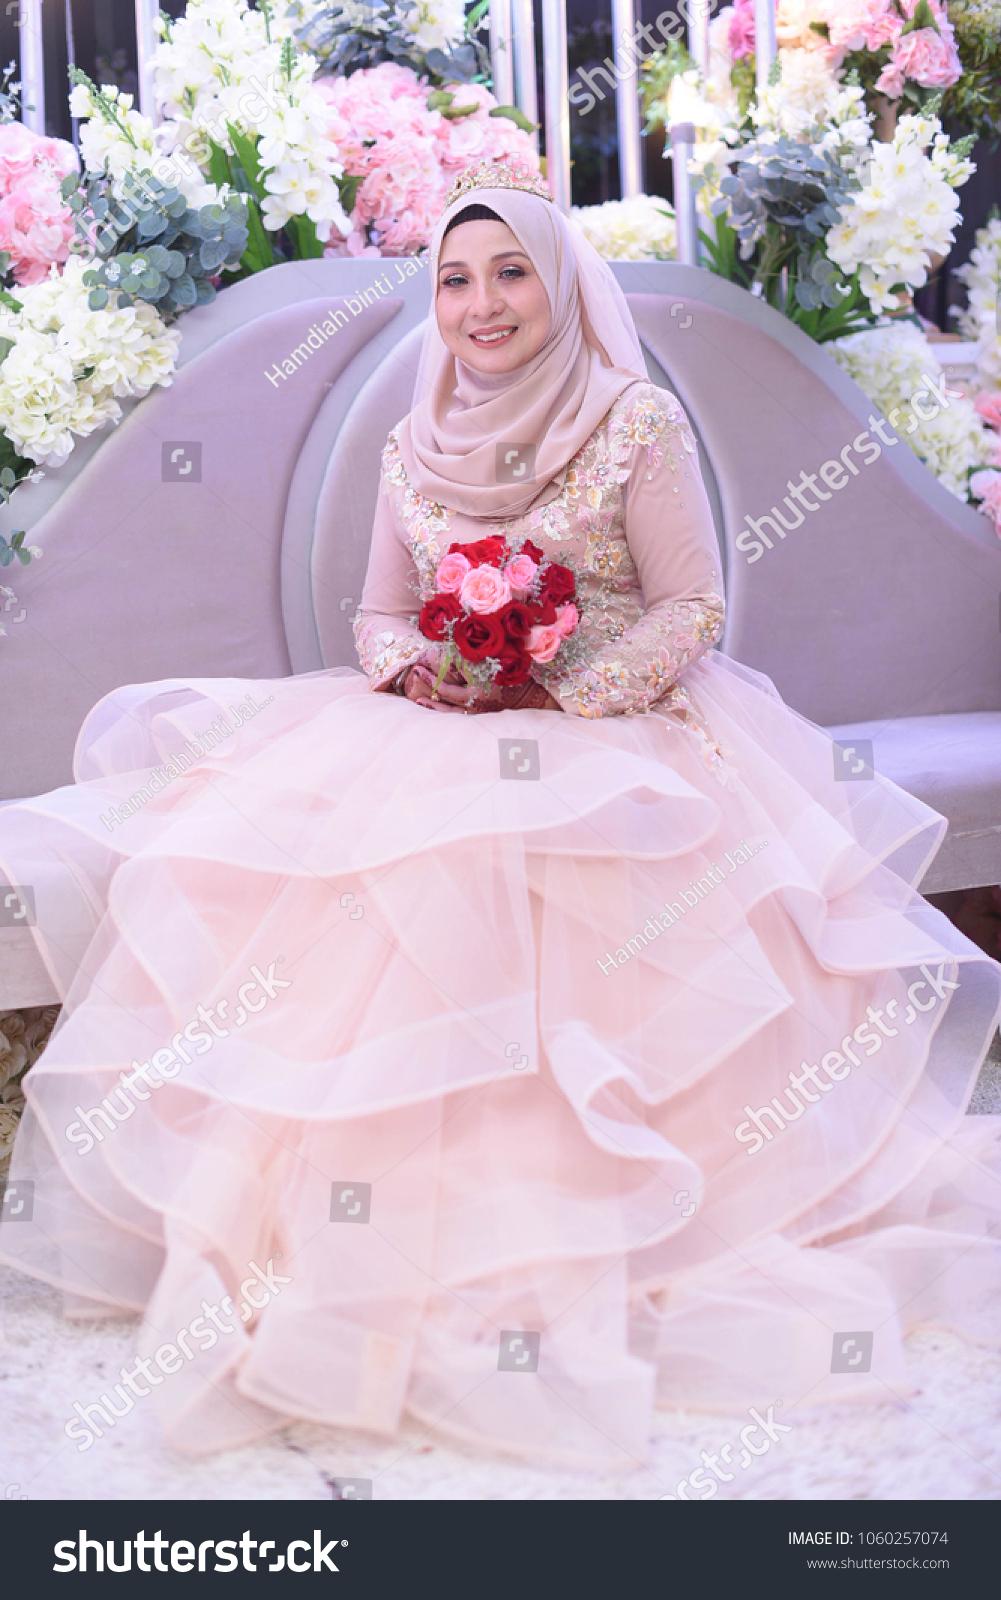 93f3f921cd46 Pink Colour Wedding Dresses